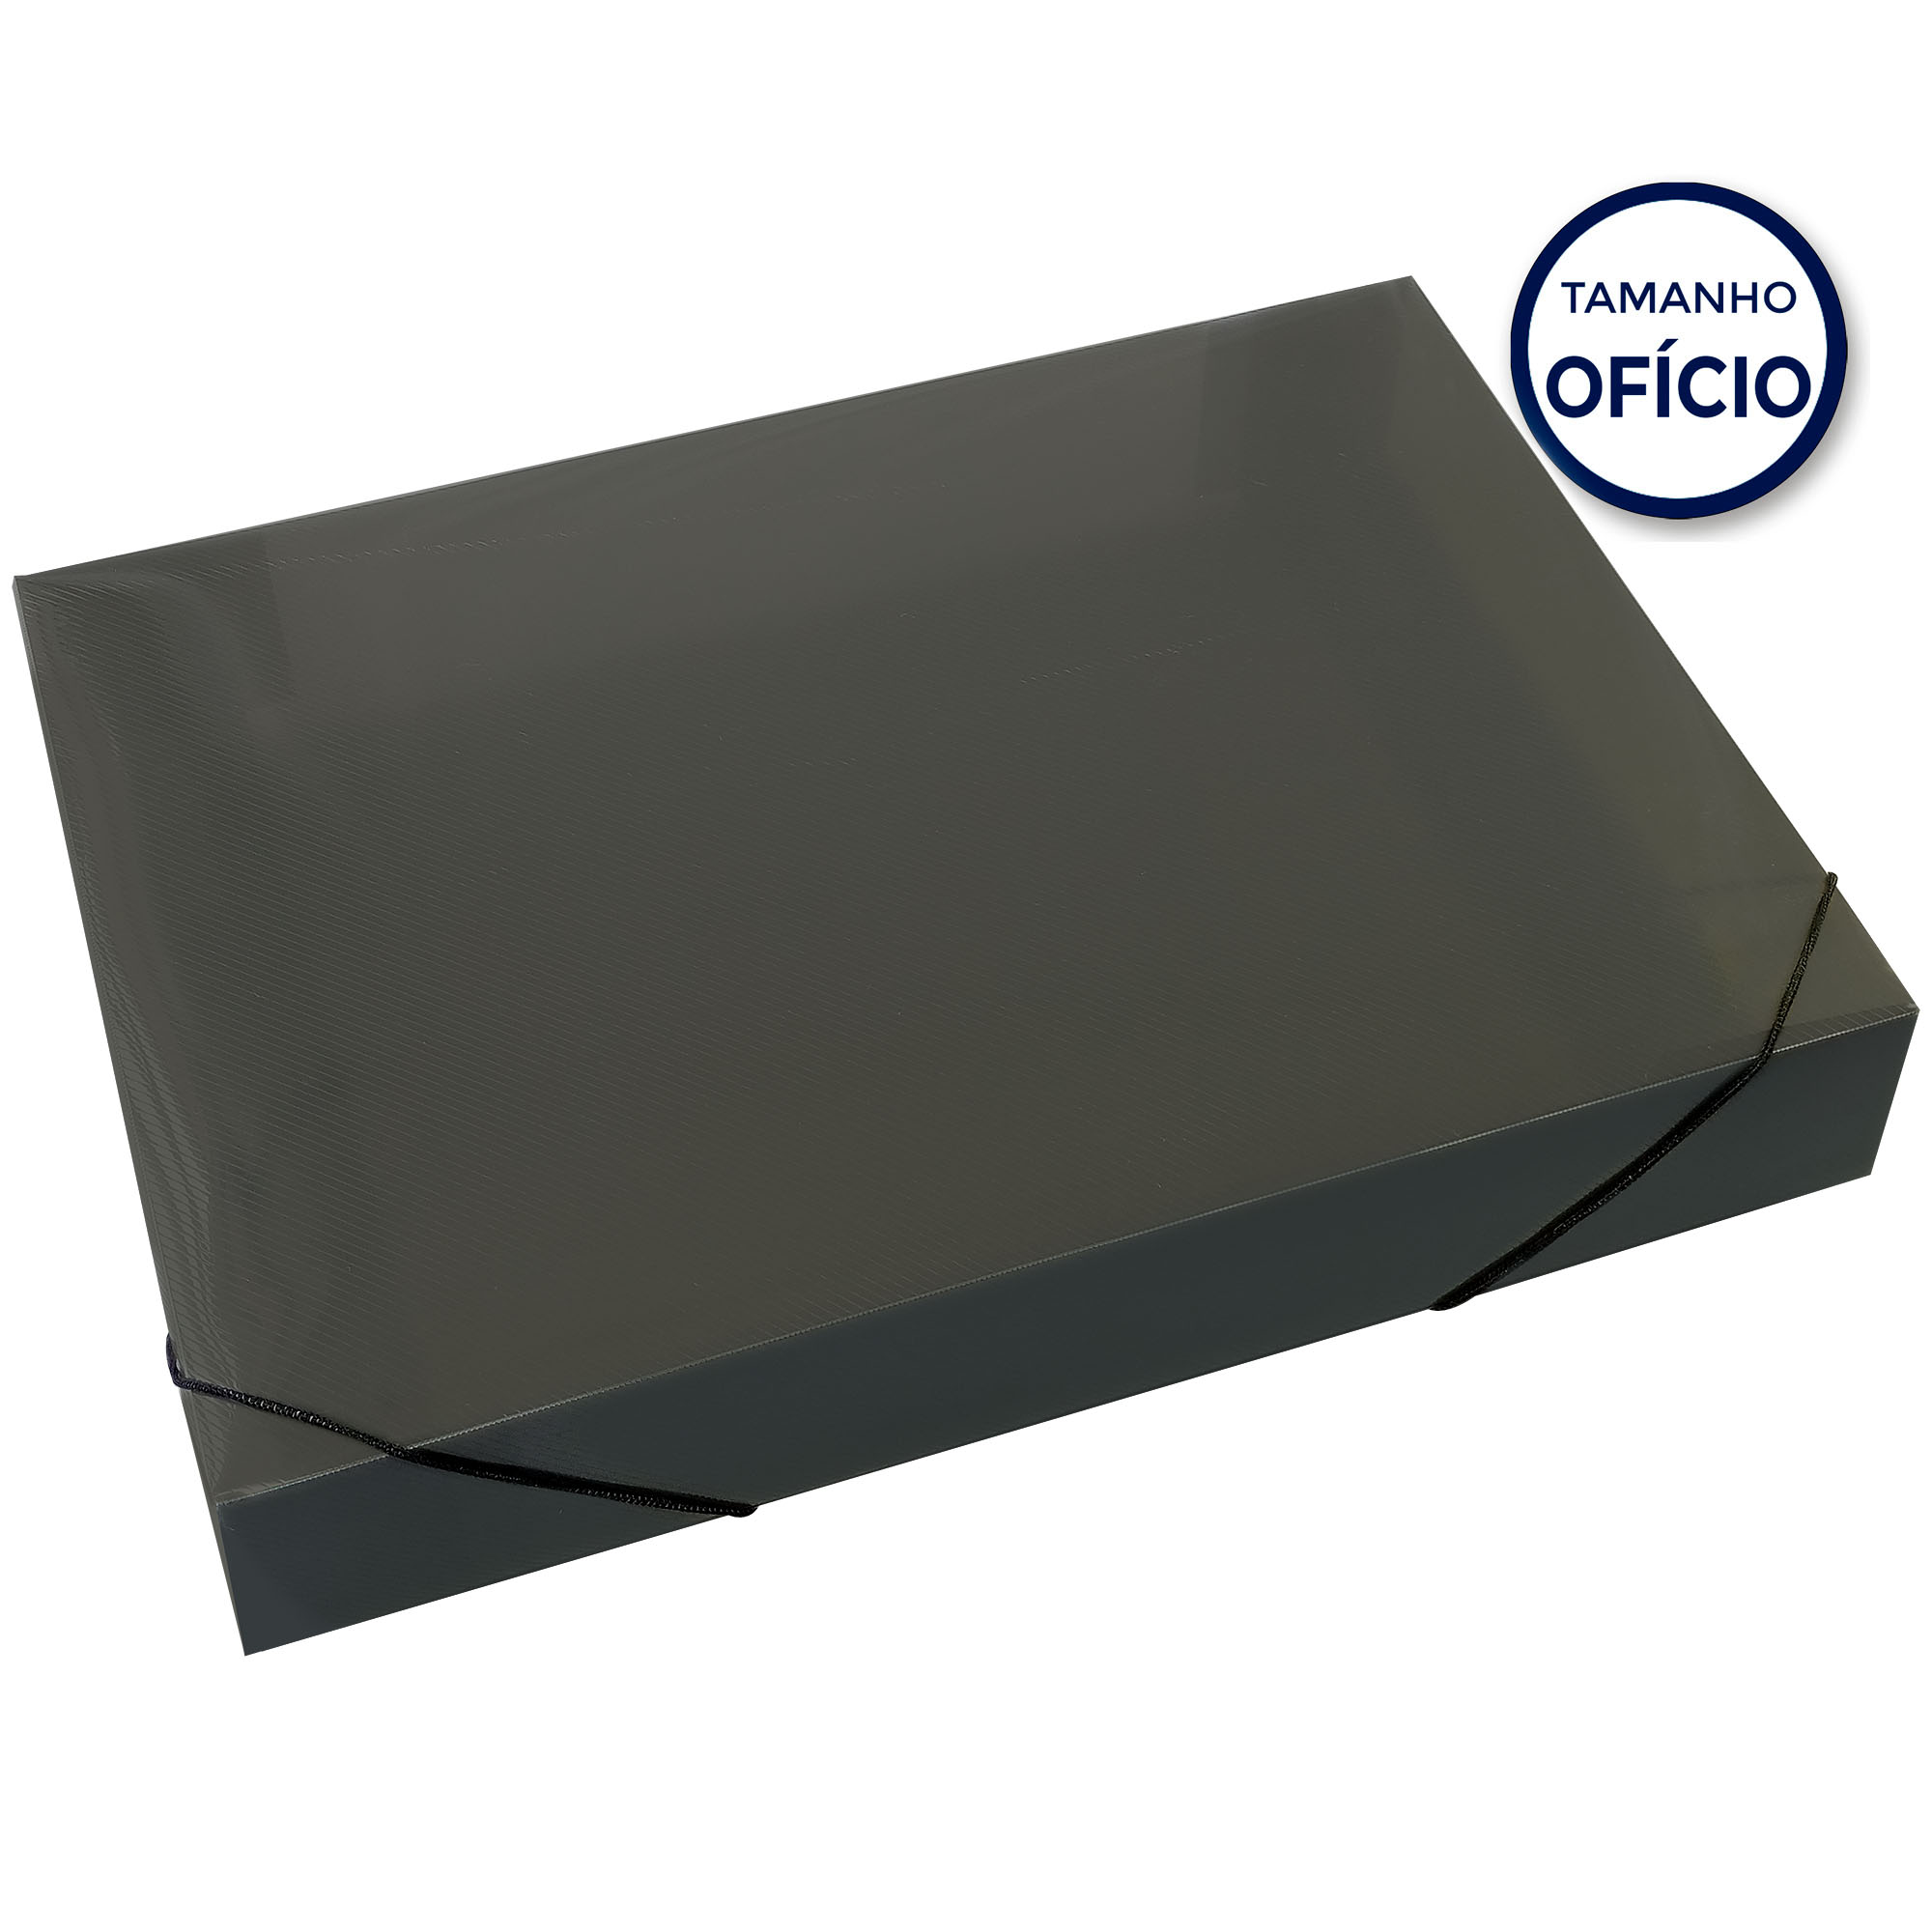 Pasta Oficio Aba Elastica 55MM Cor Fume Soft 160716 - Polibras